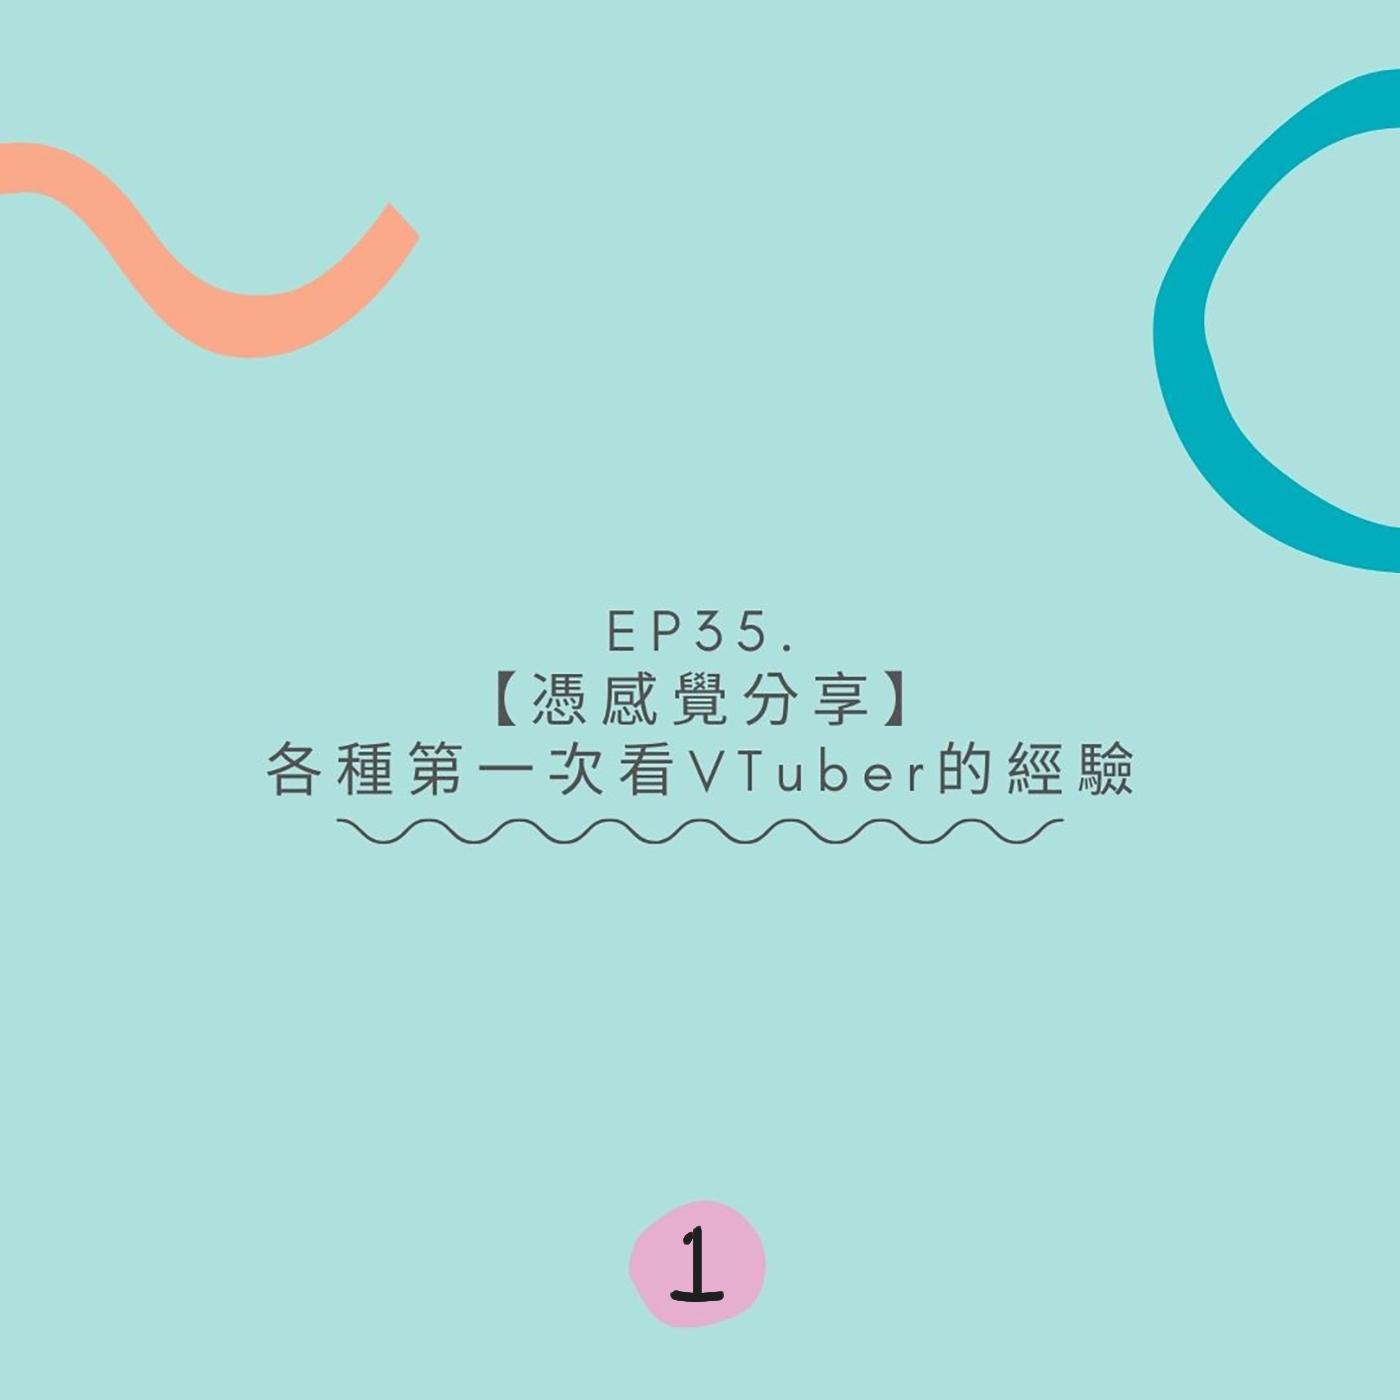 EP35-【憑感覺分享】各種第一次看VTuber的經驗